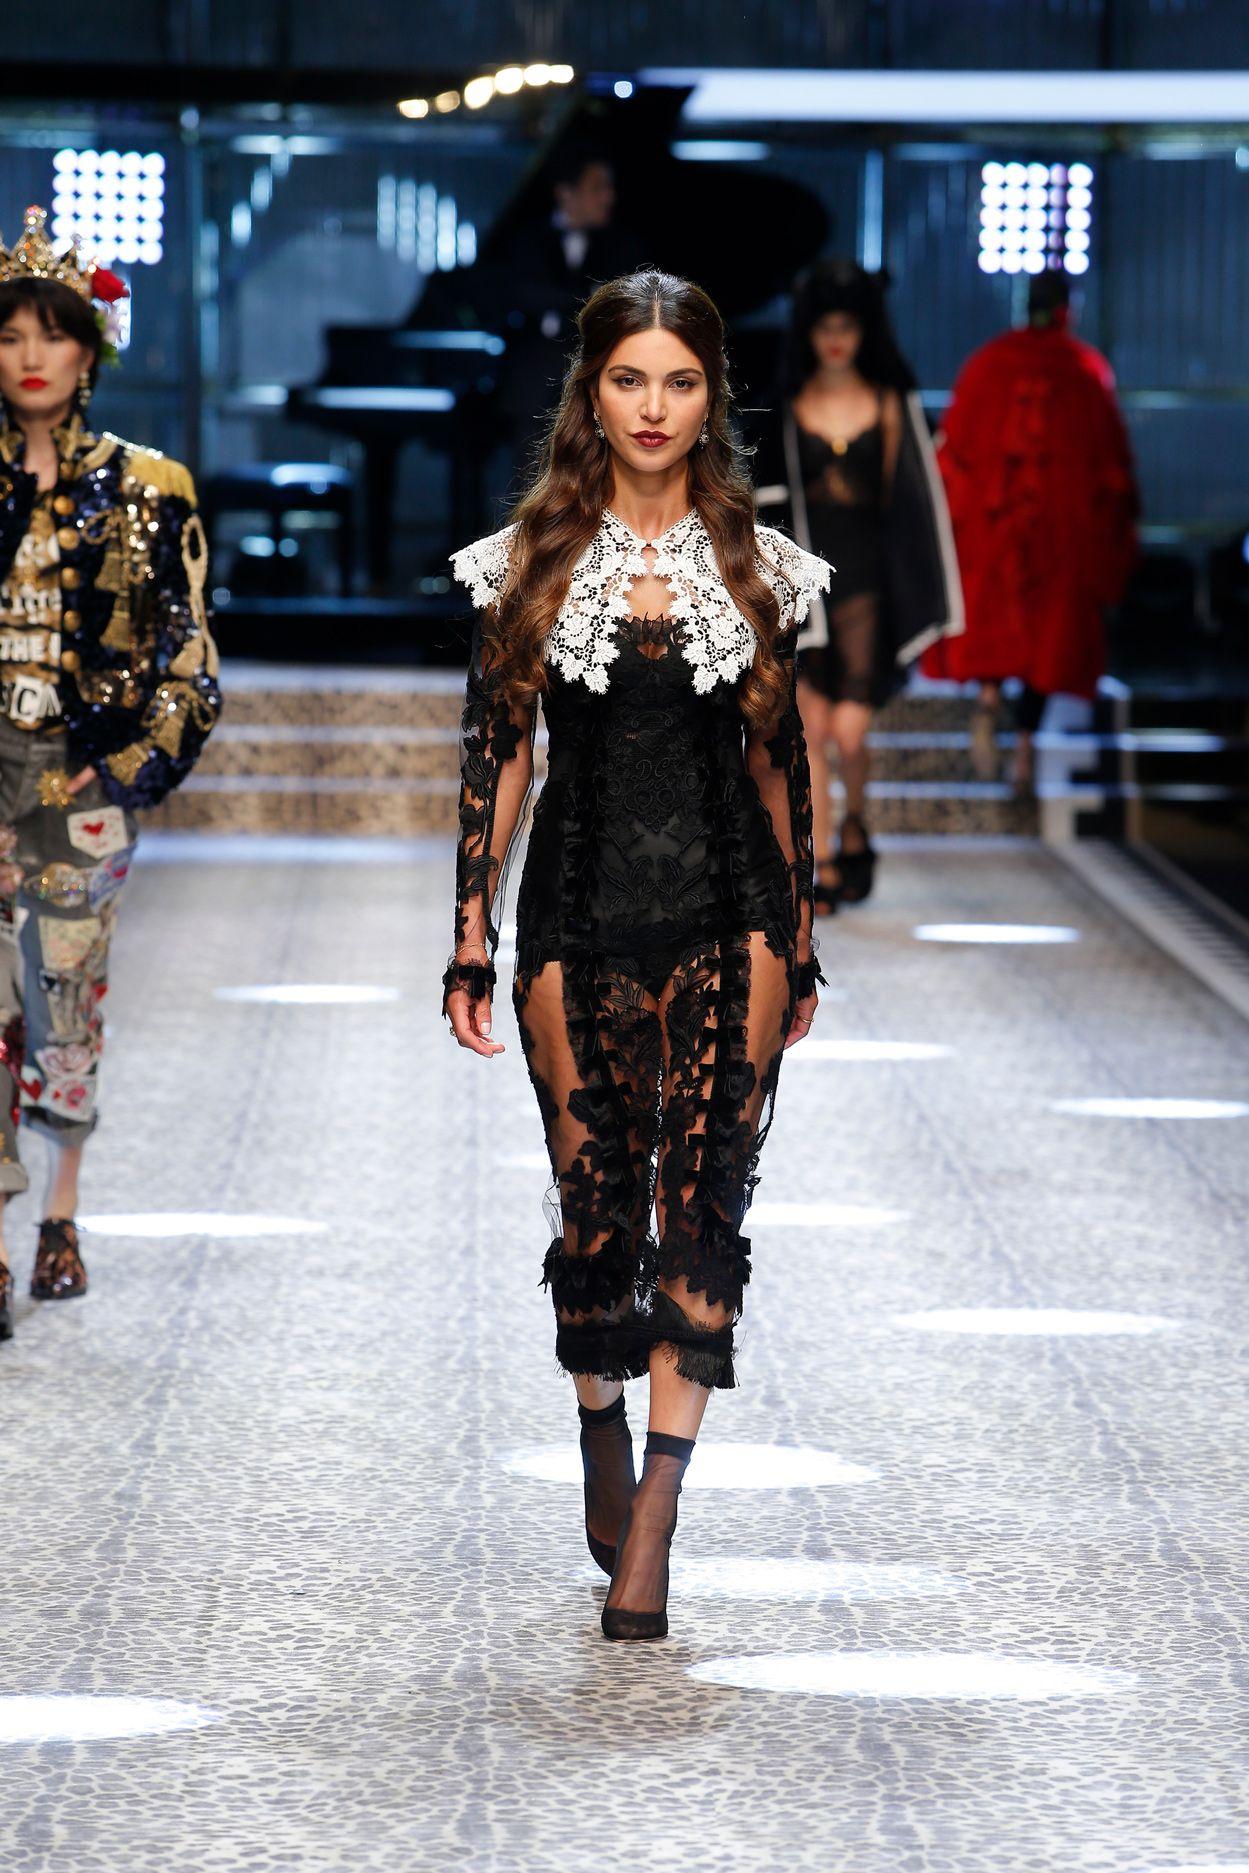 DGFabulousFantasy: Dolce Gabbana Fall 2019 Tells Its Own Fairy Story recommendations